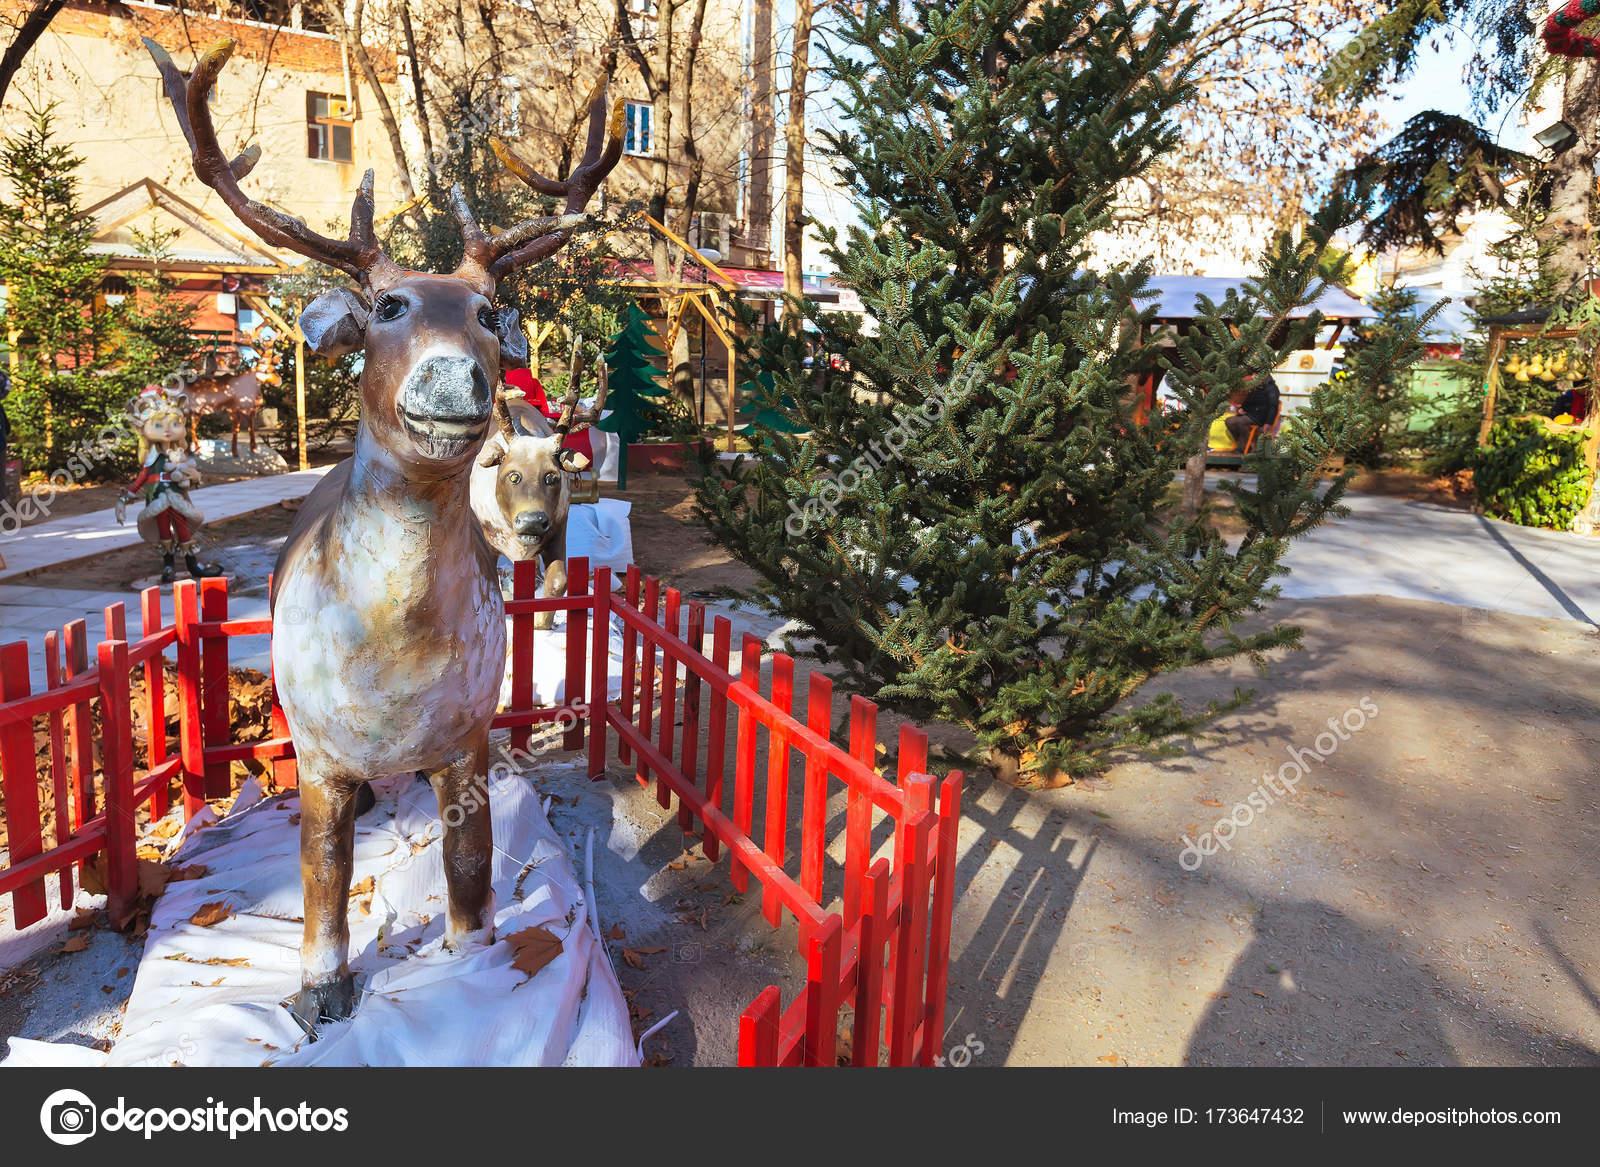 Greek Christmas.Deer Decoration Figurine At Greek Christmas Market Stock